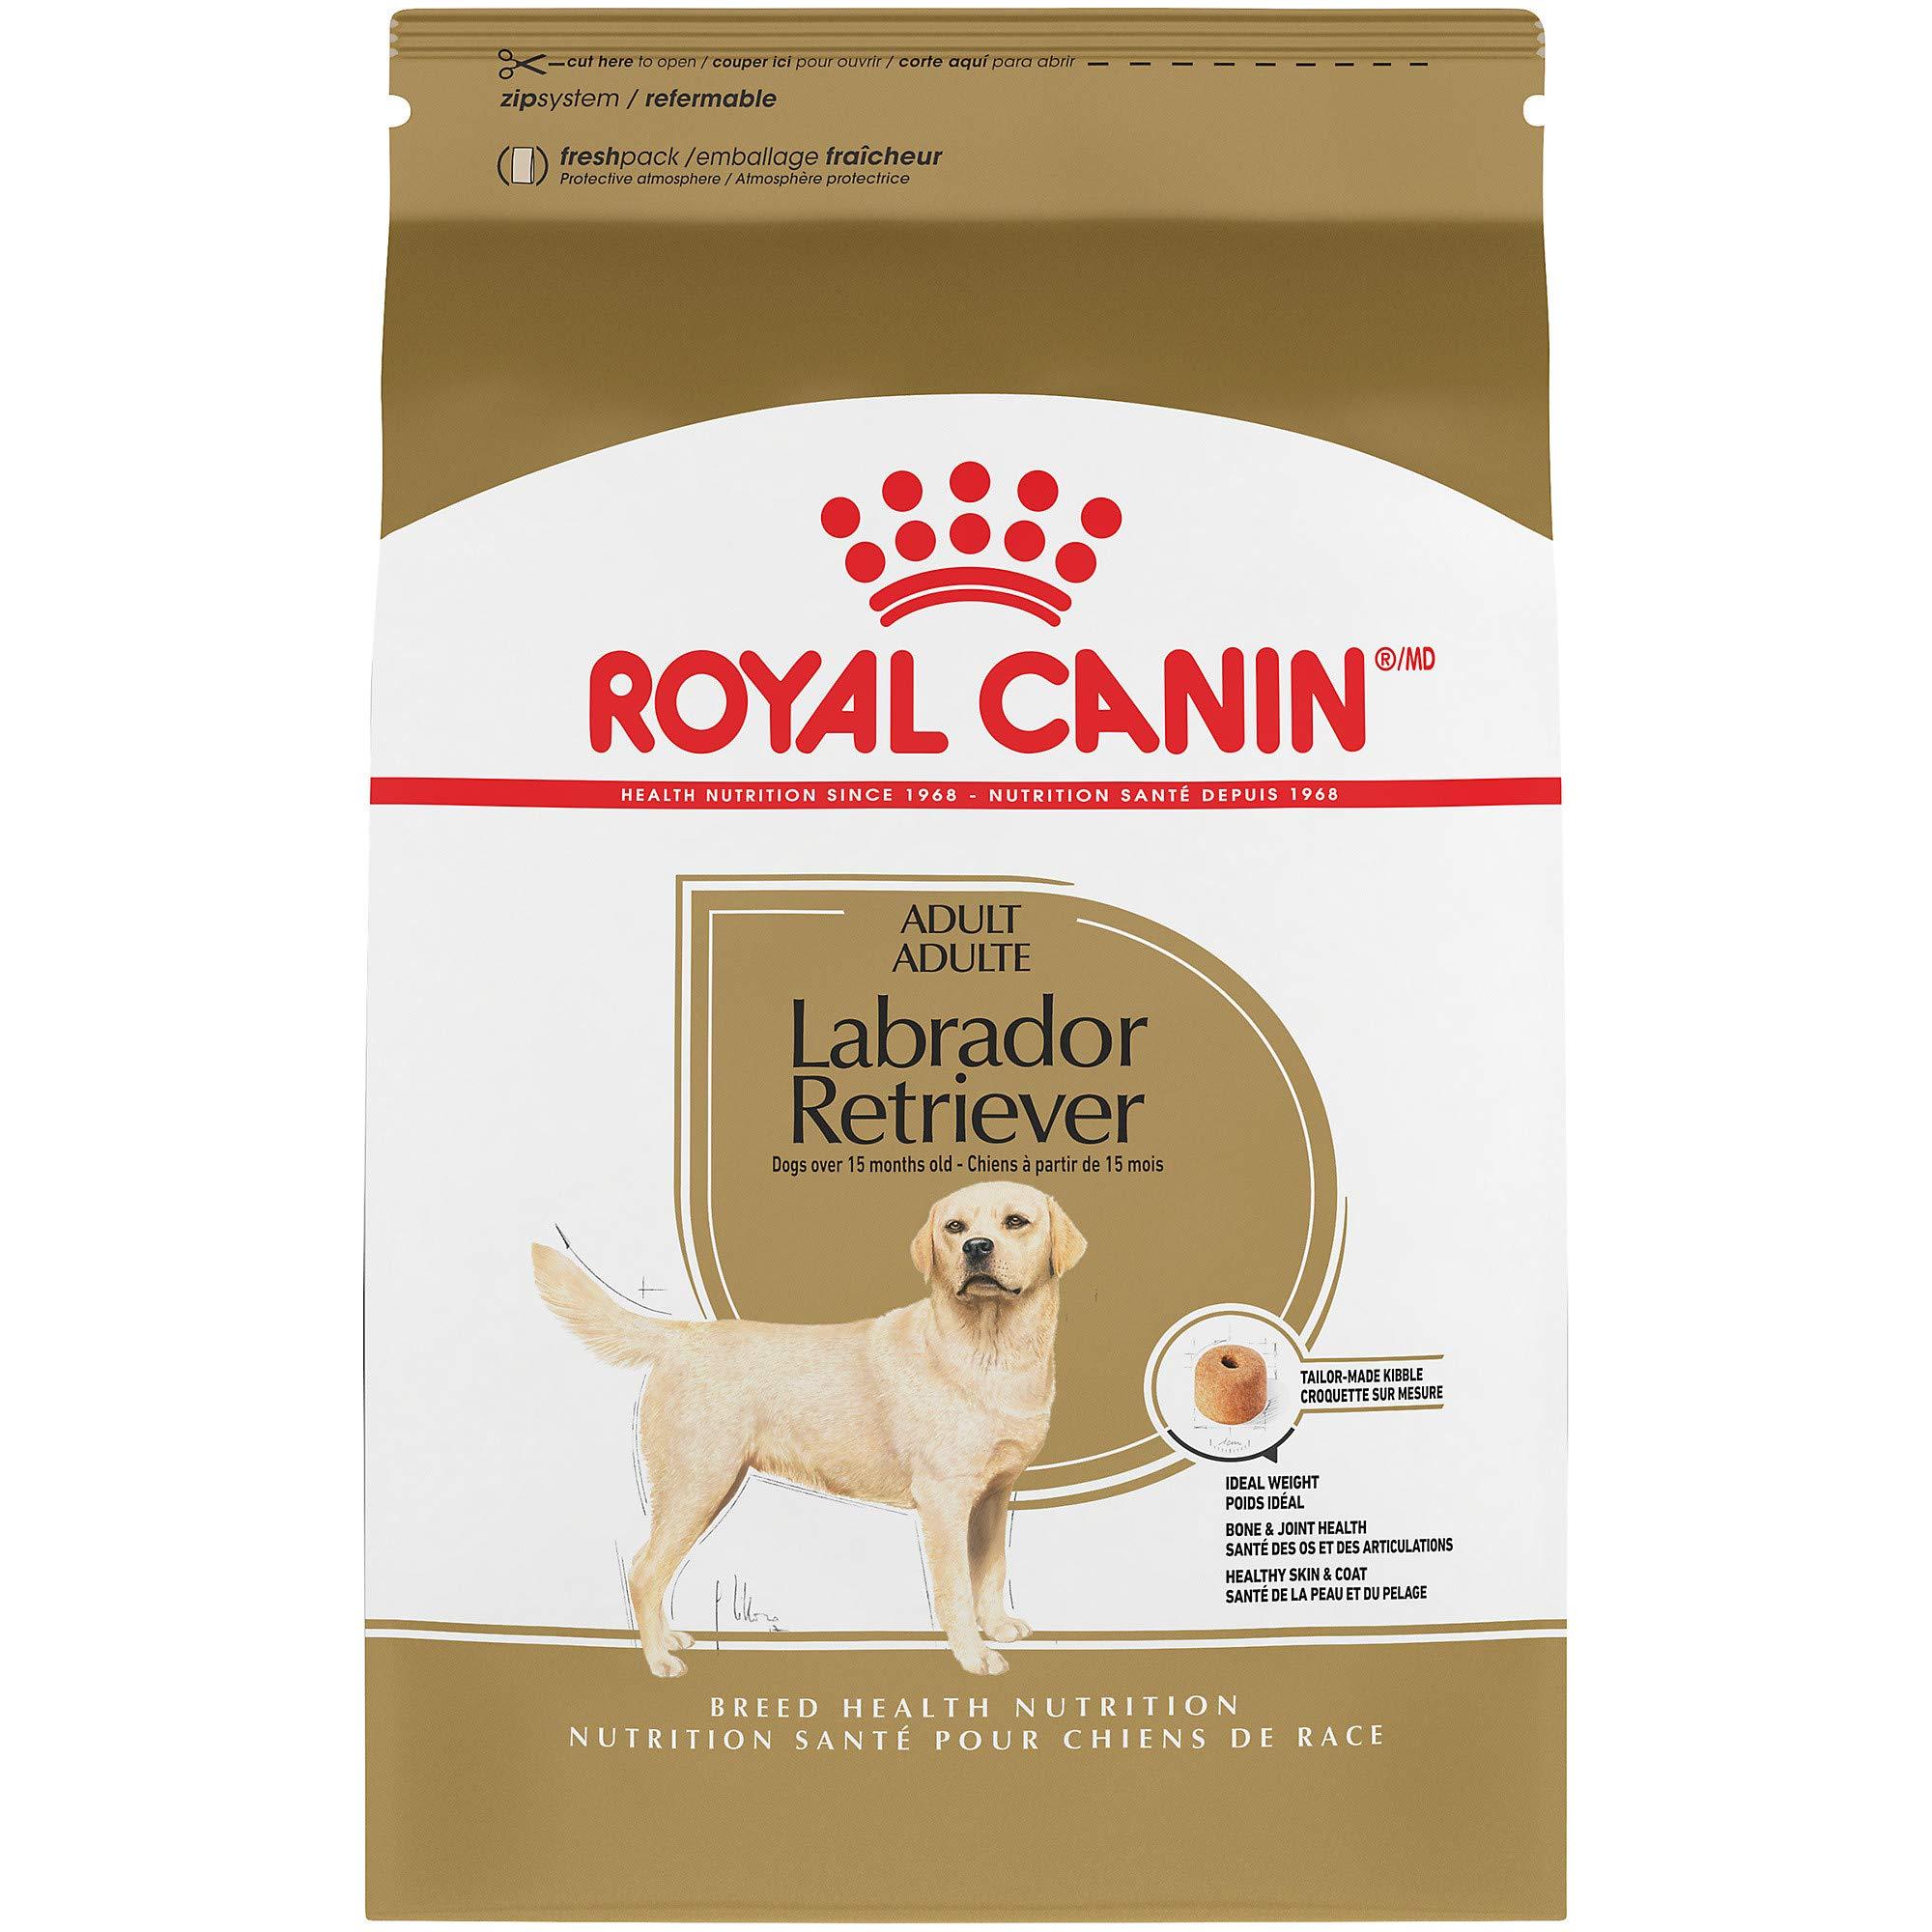 ROYAL CANIN Breed Health Nutrition Labrador Retriever (30 lb)